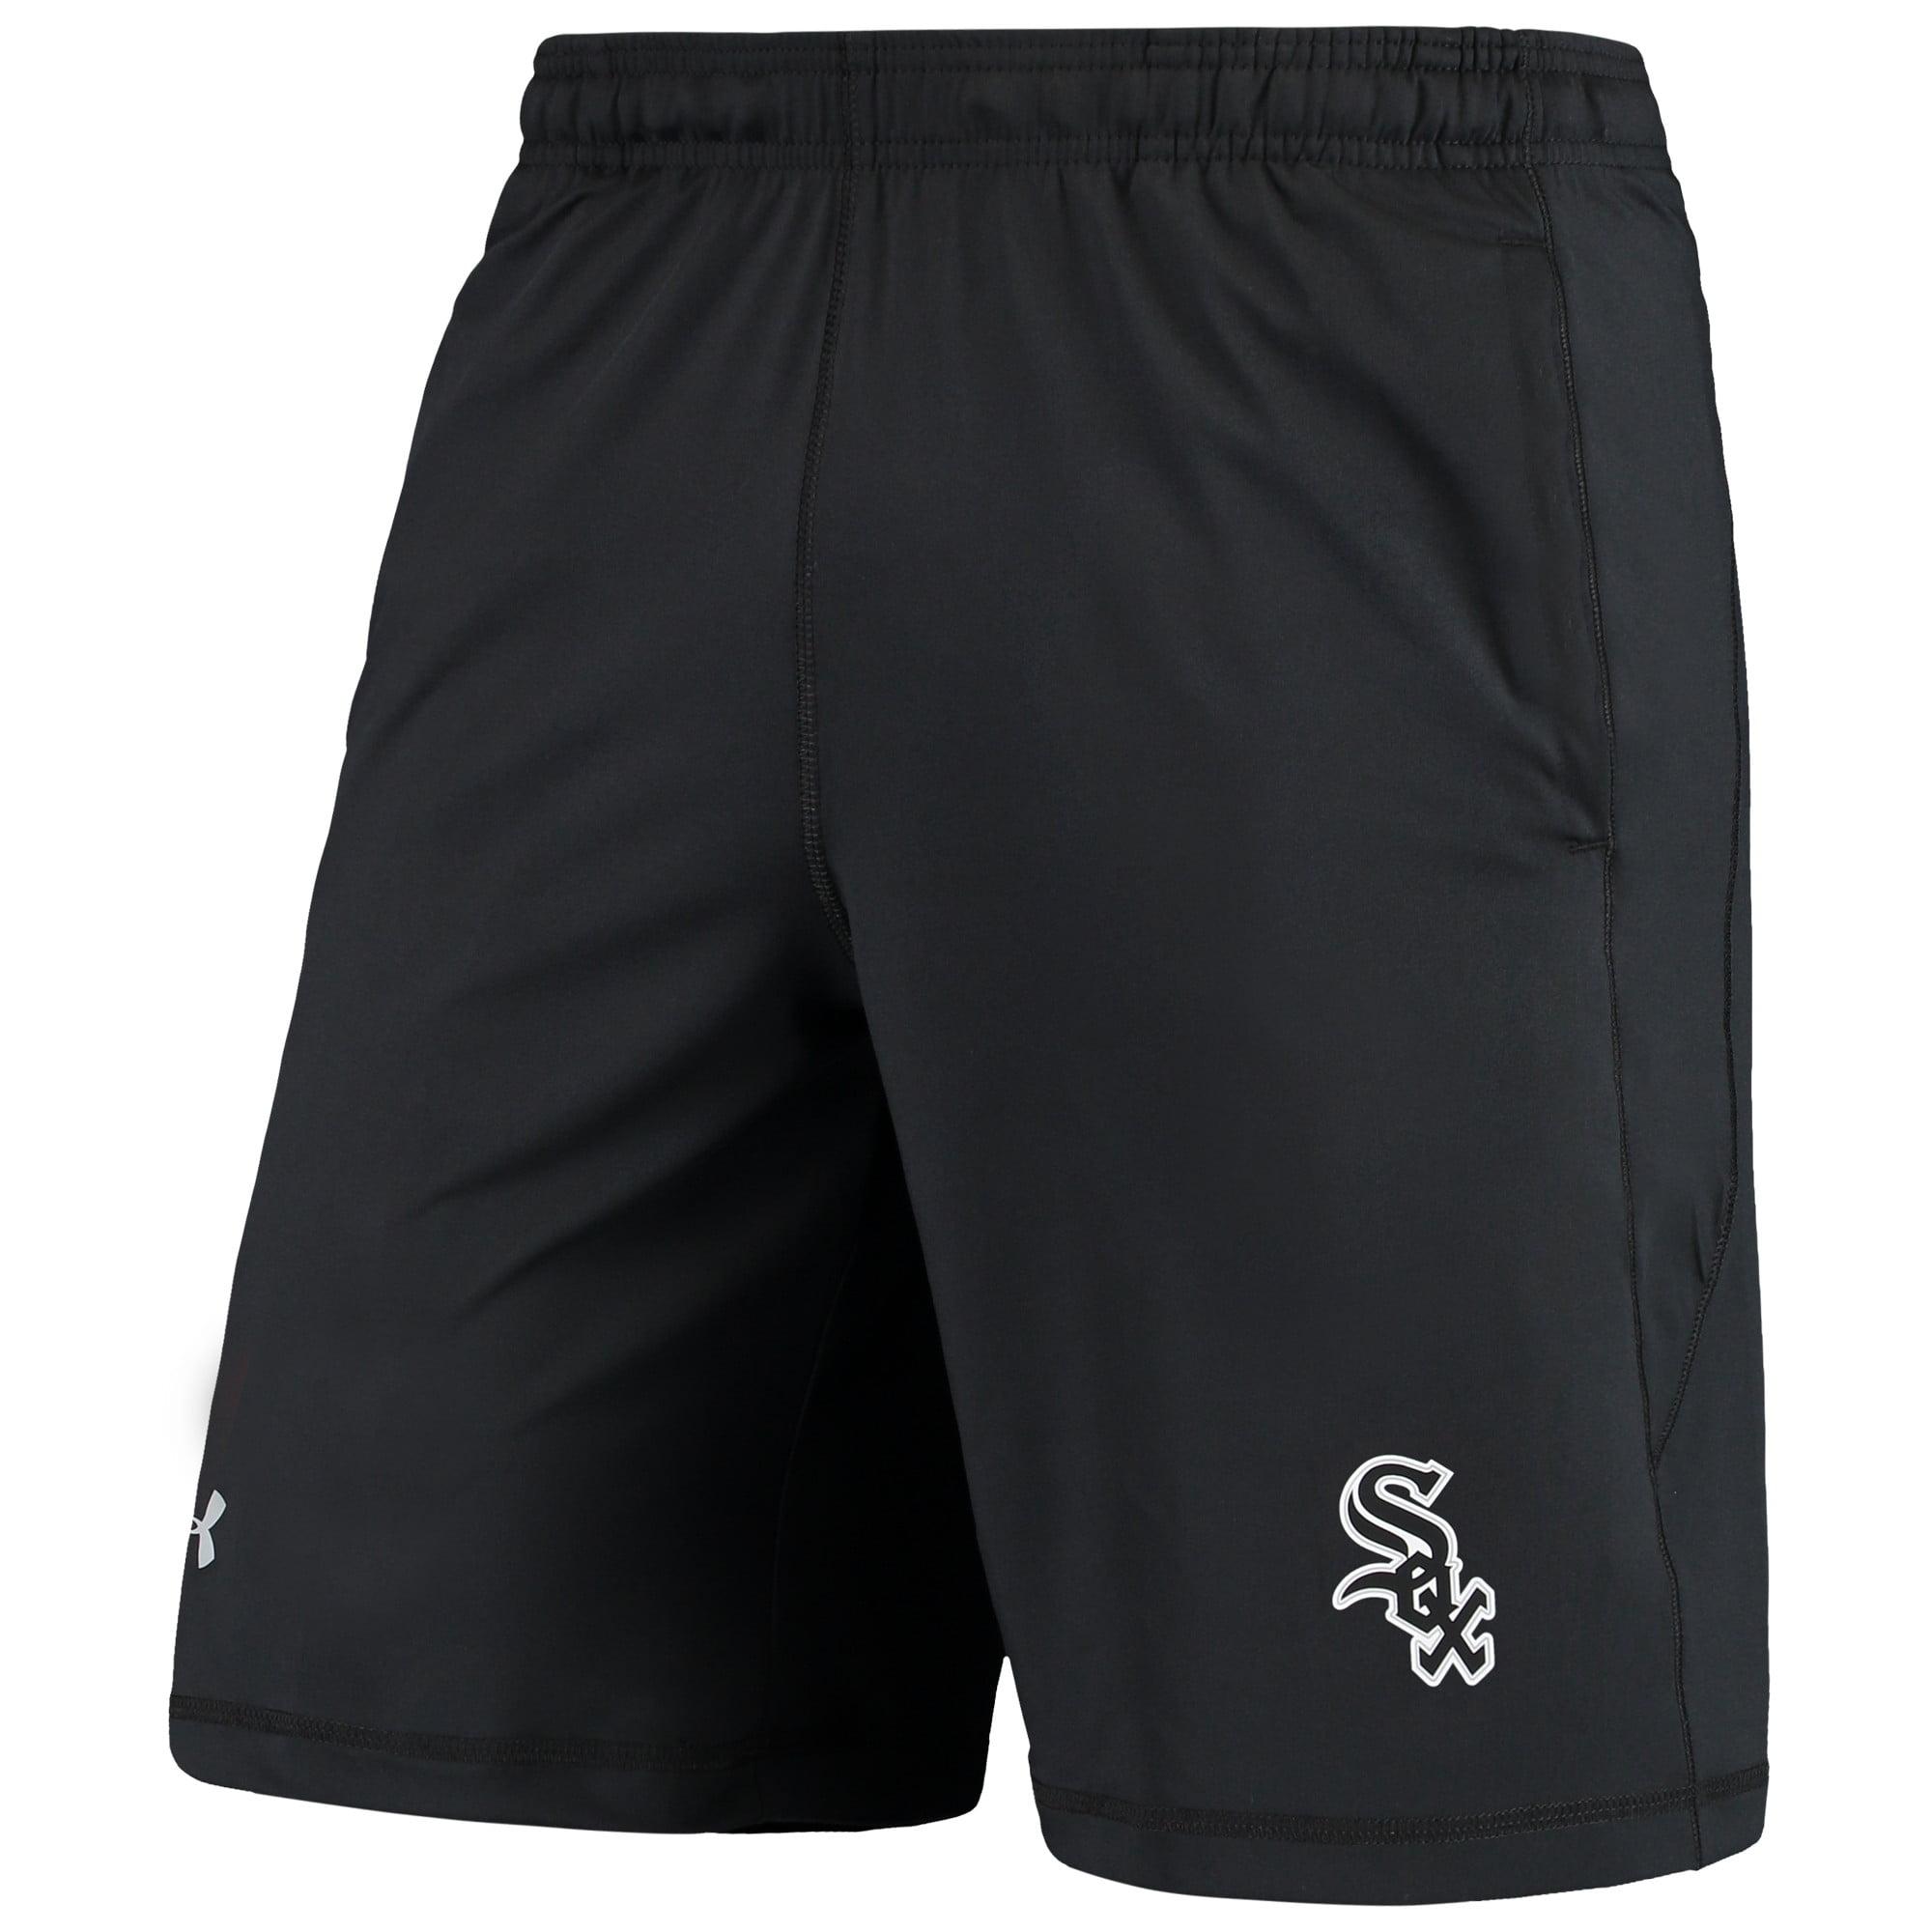 Chicago White Sox Under Armour Raid Left Leg Performance Shorts - Black